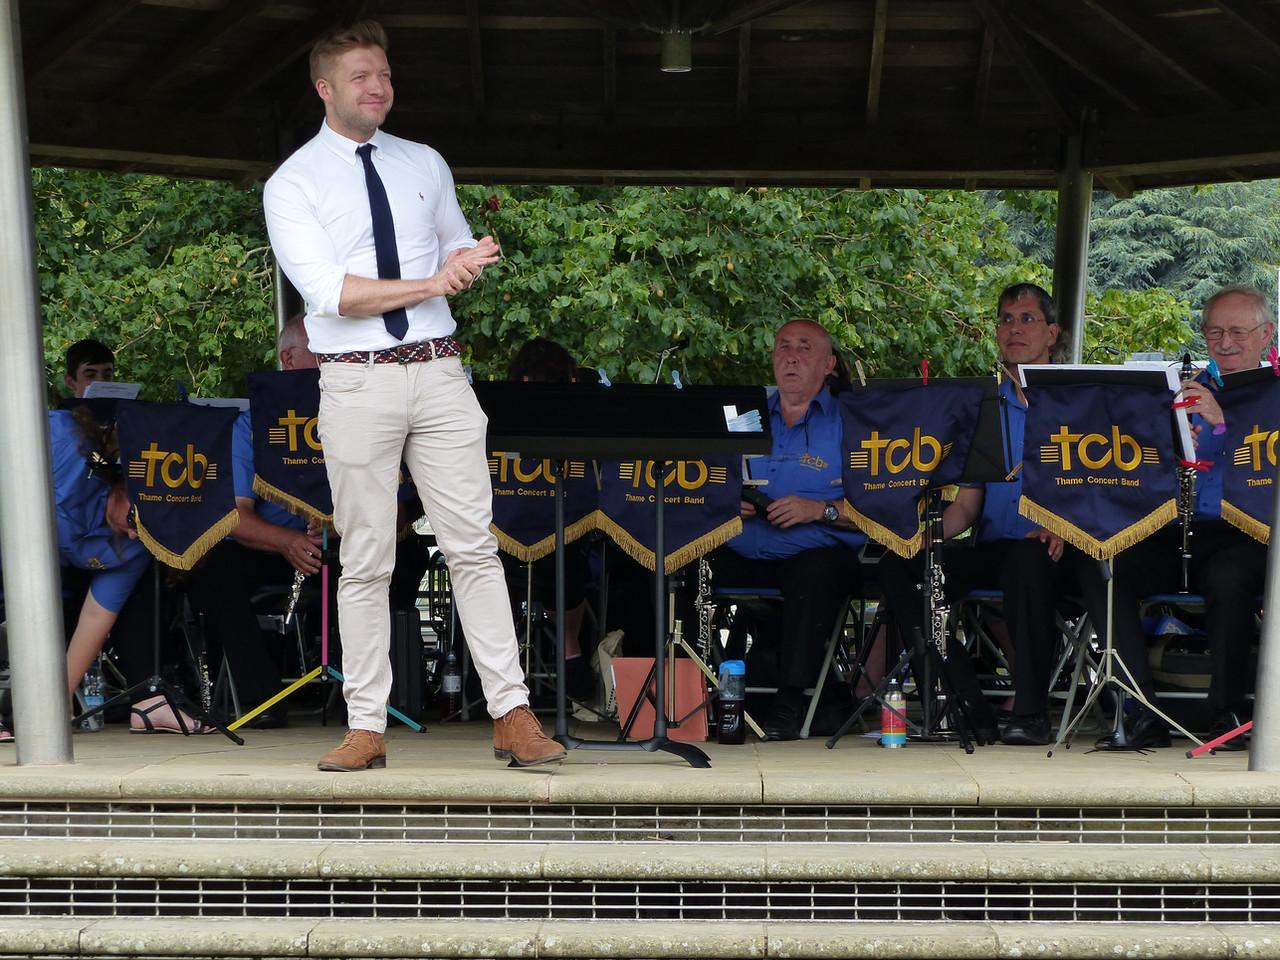 Henley bandstand 2019 [1].JPG